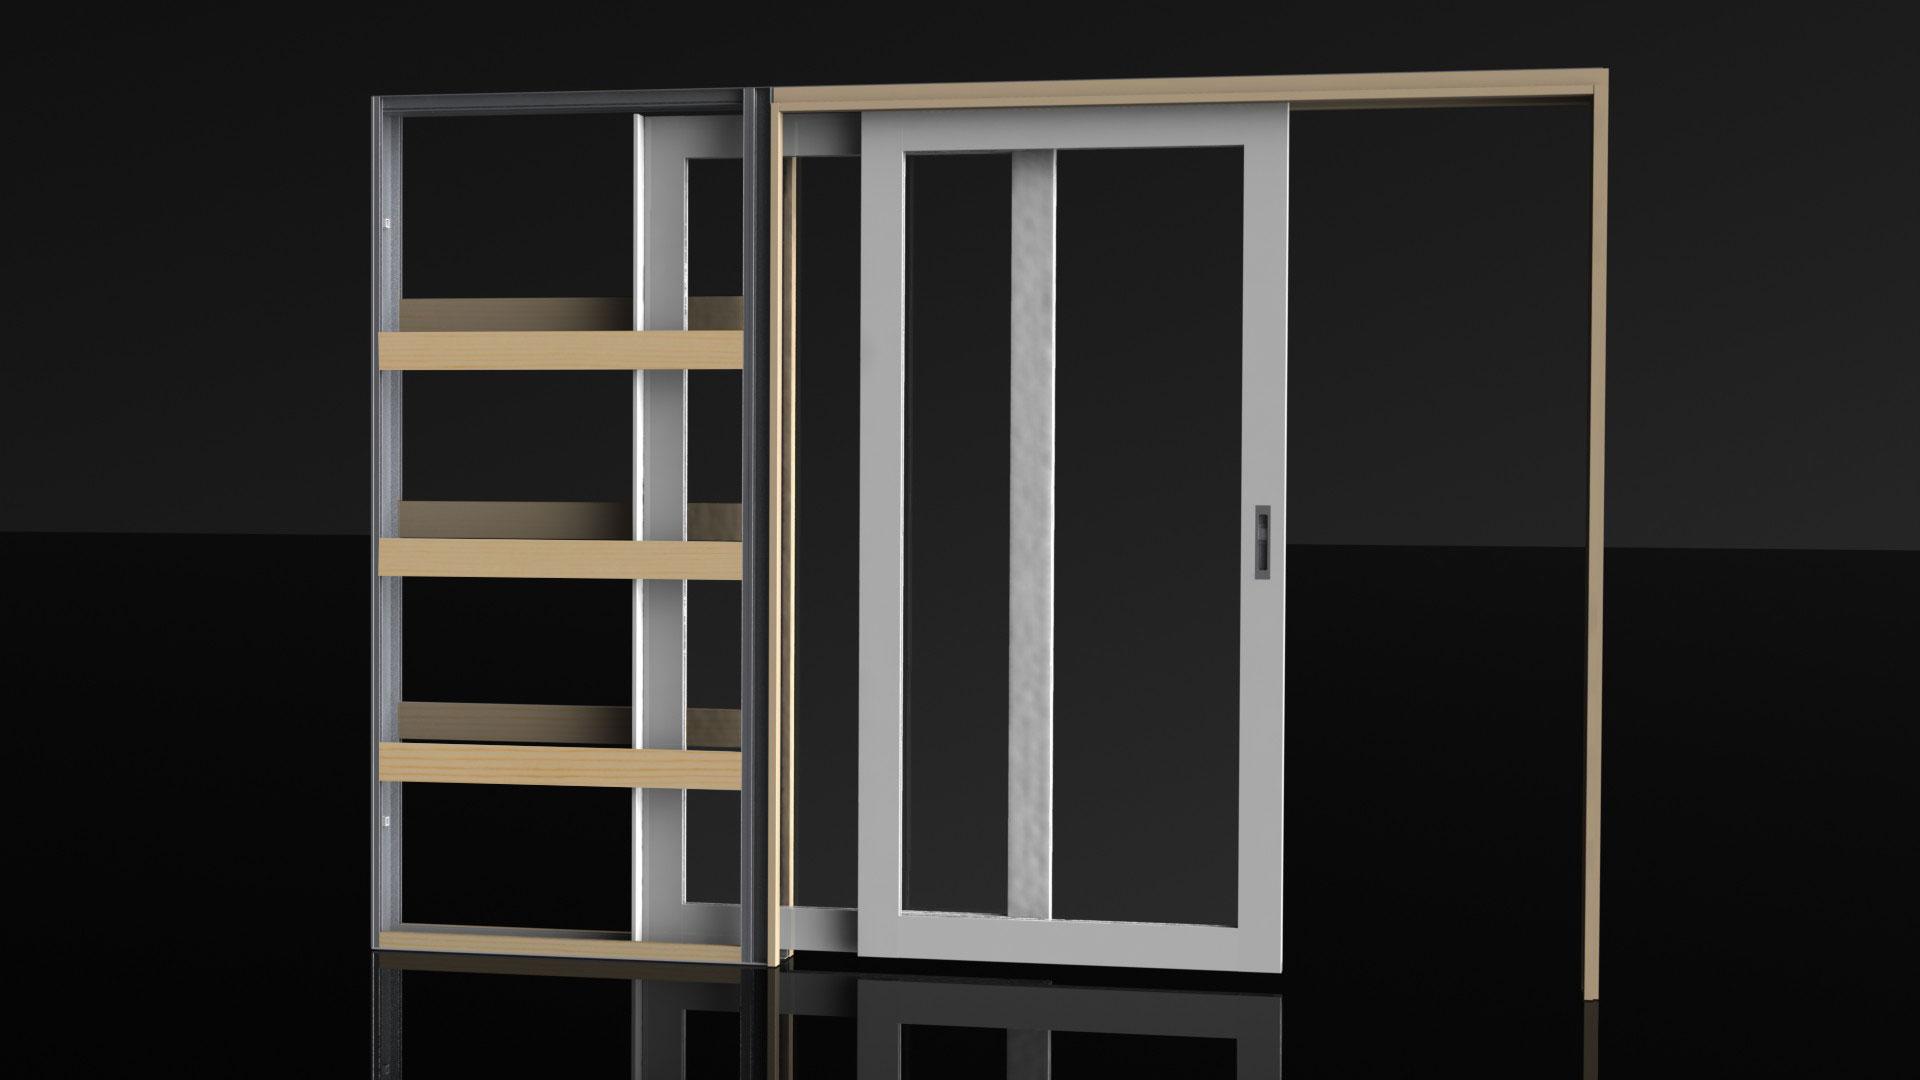 Overtaking Doors Cavity Sliders For Large Openings